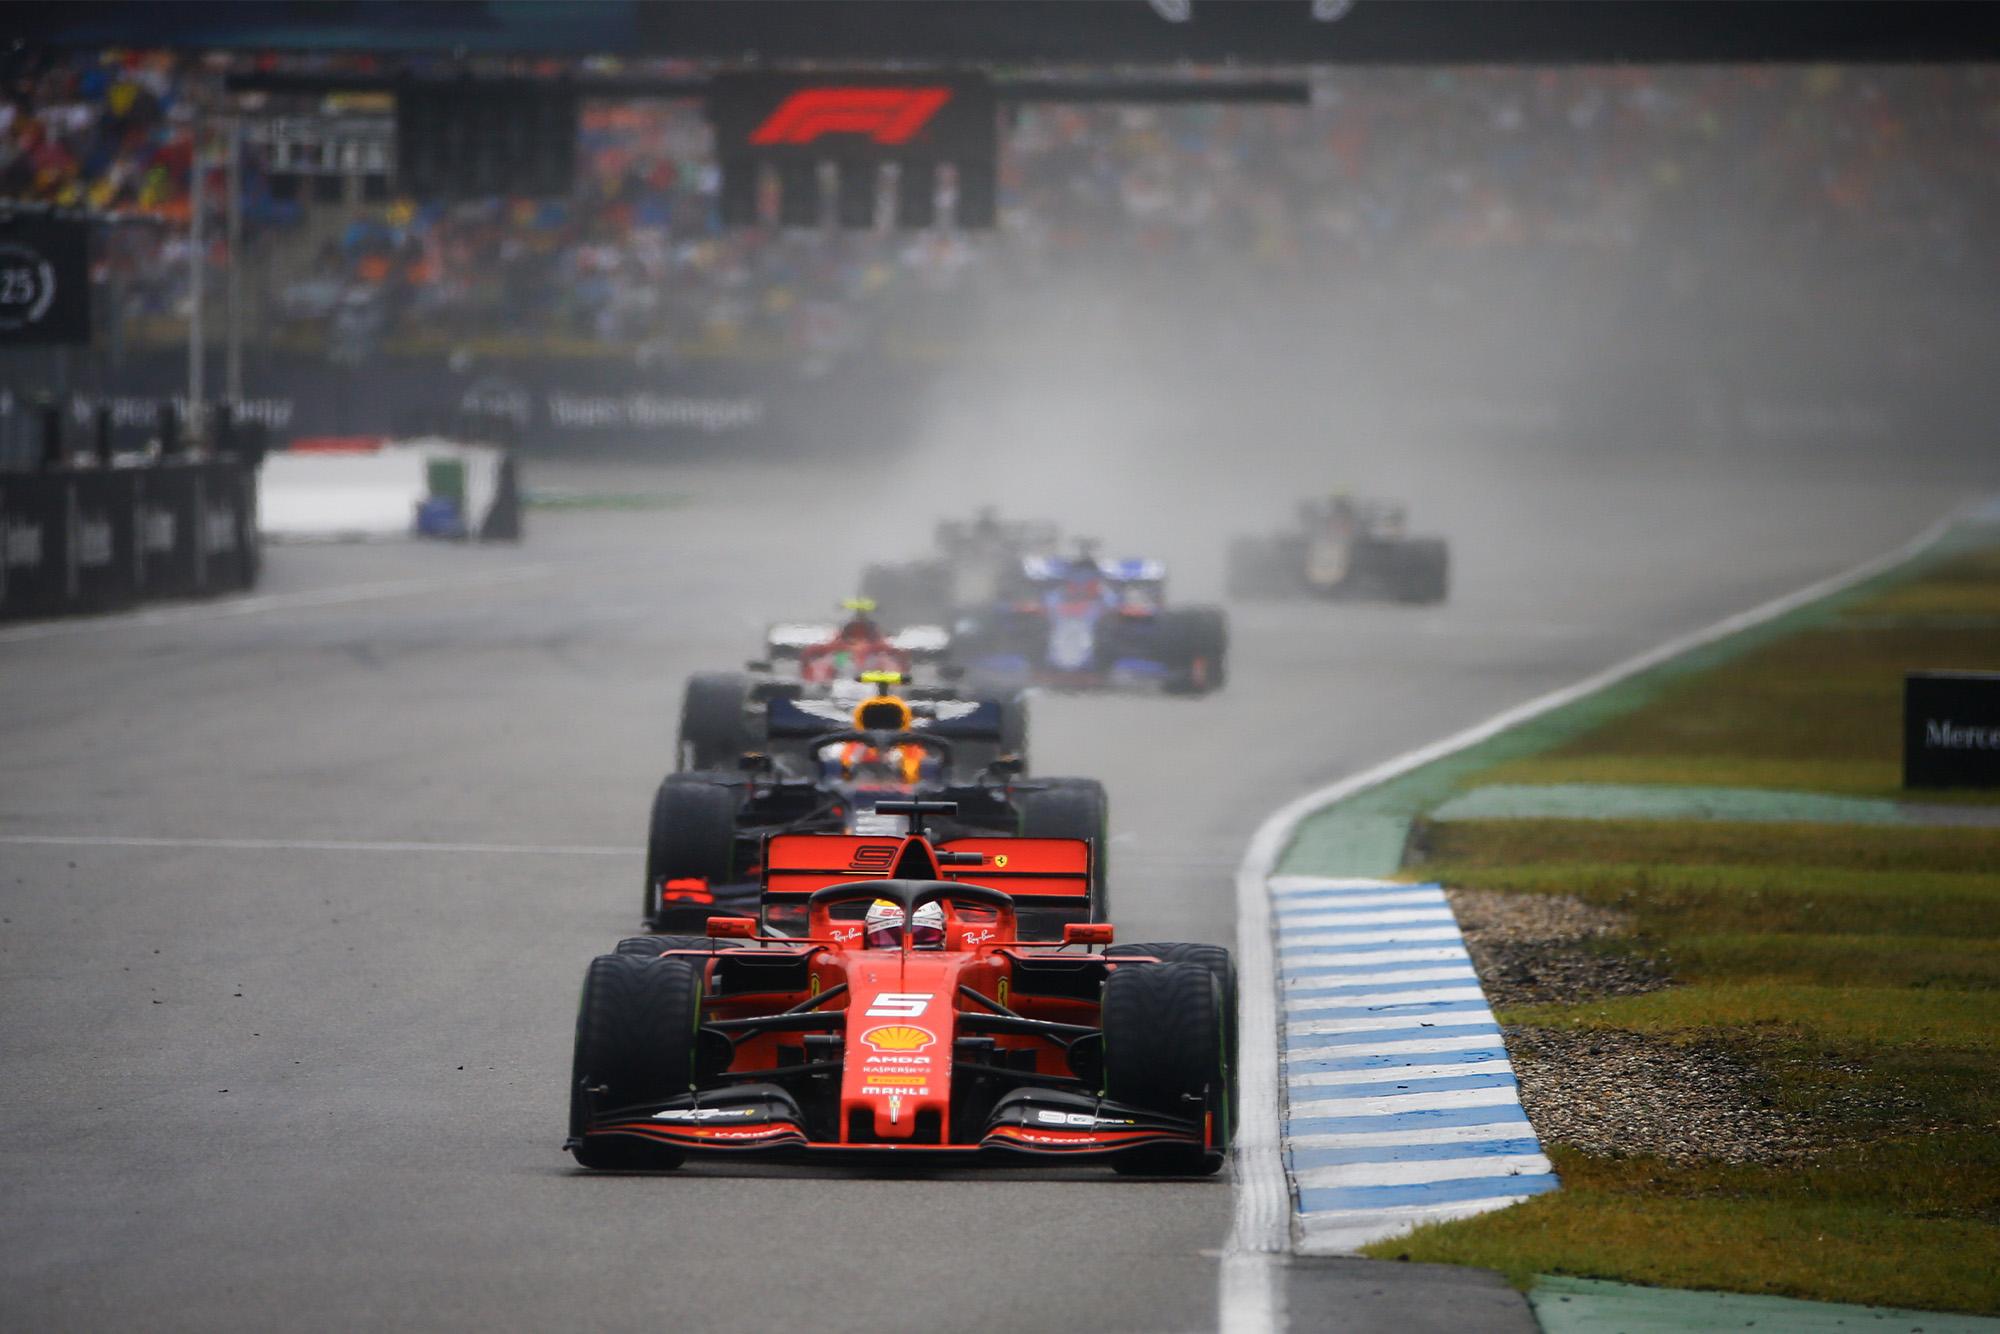 Sebastian Vettel fought back to finish third in the 2019 German Grand Prix